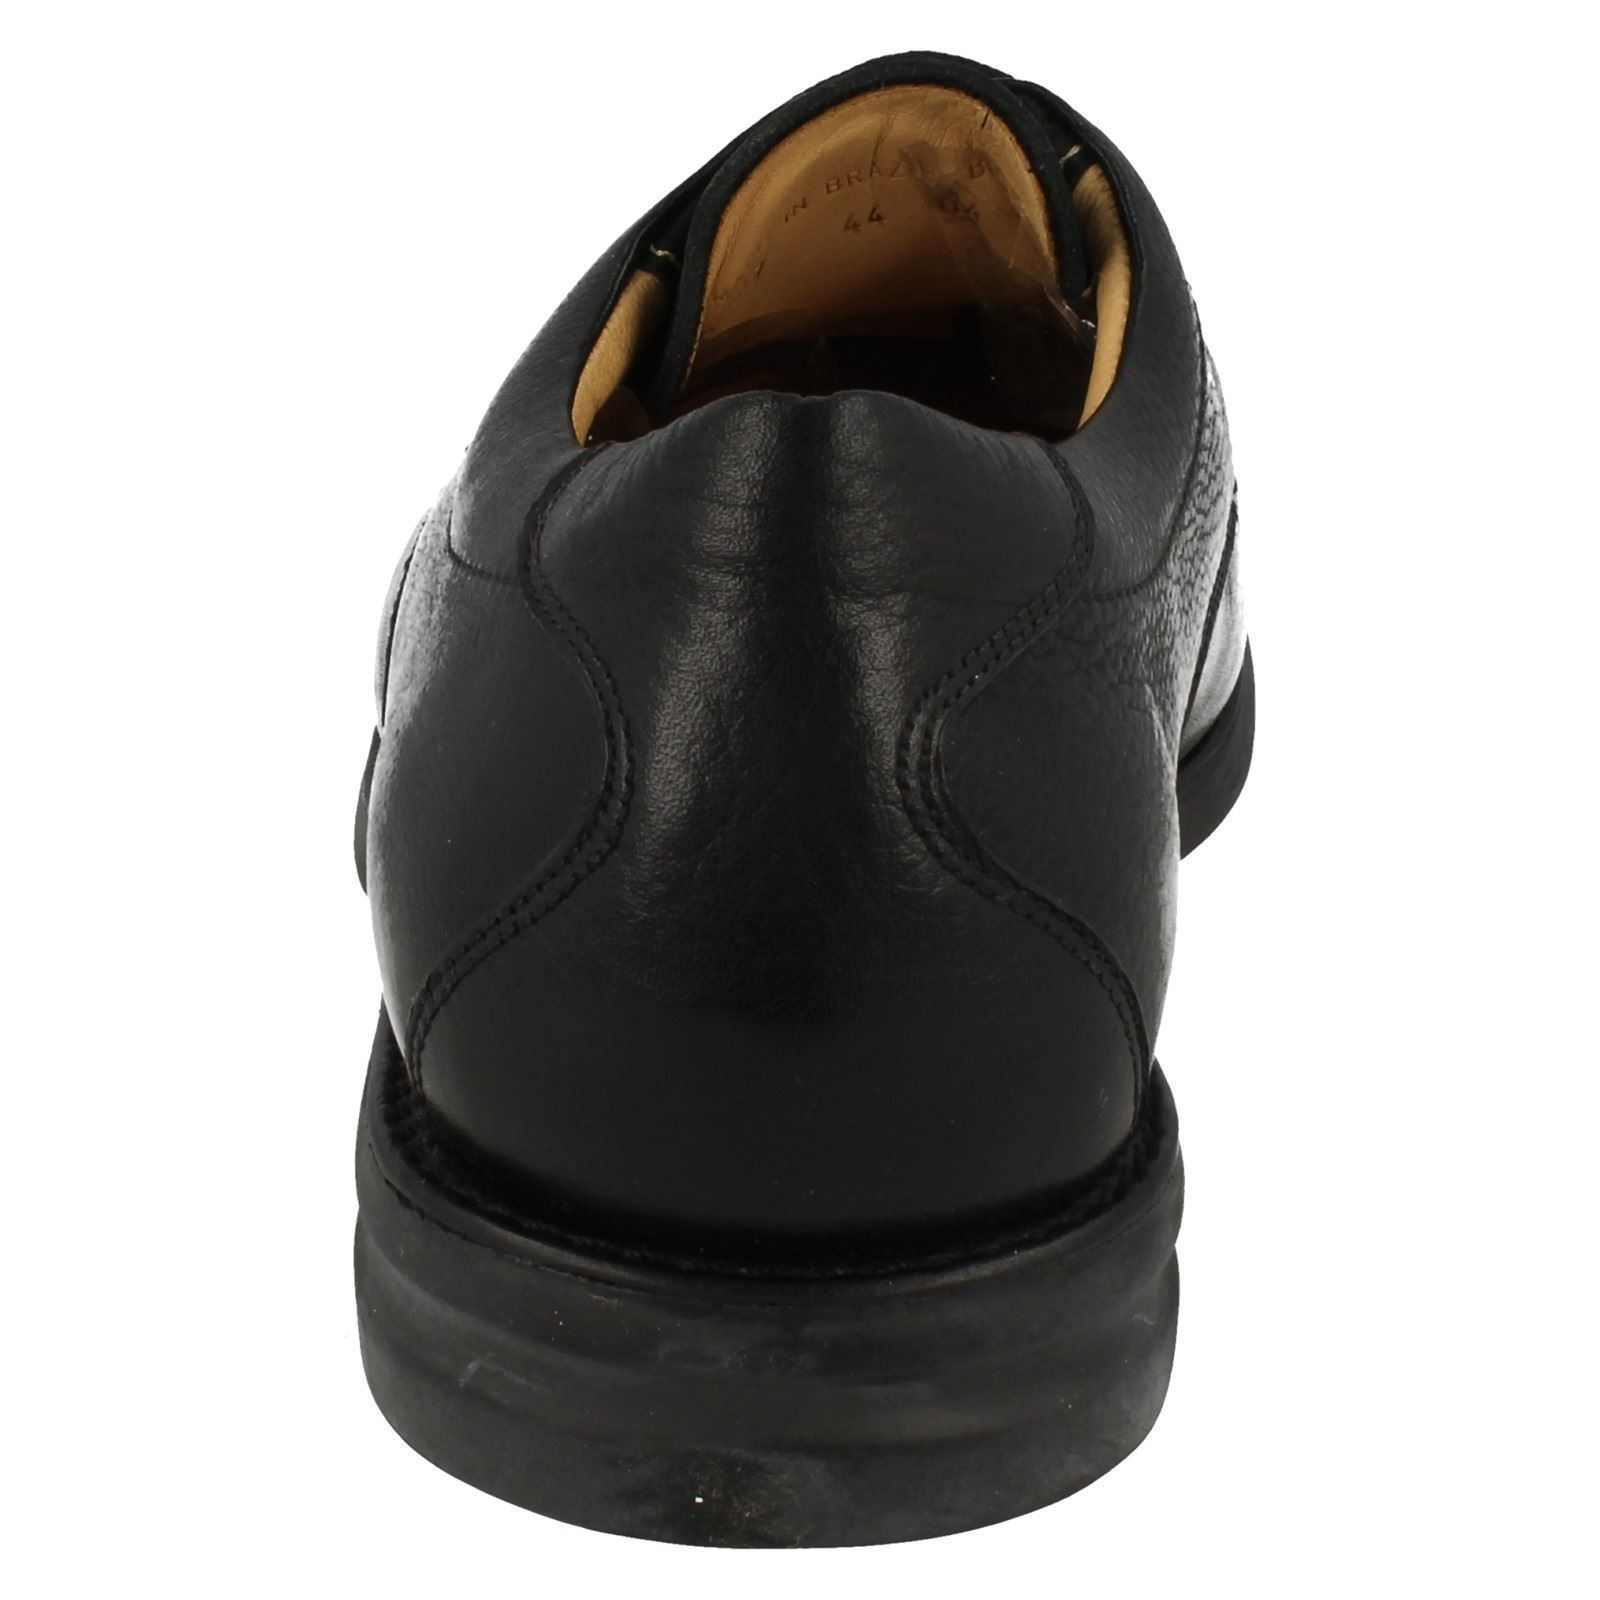 Mens Anatomic Lace-Up Schuhes NEU Recife Style  K